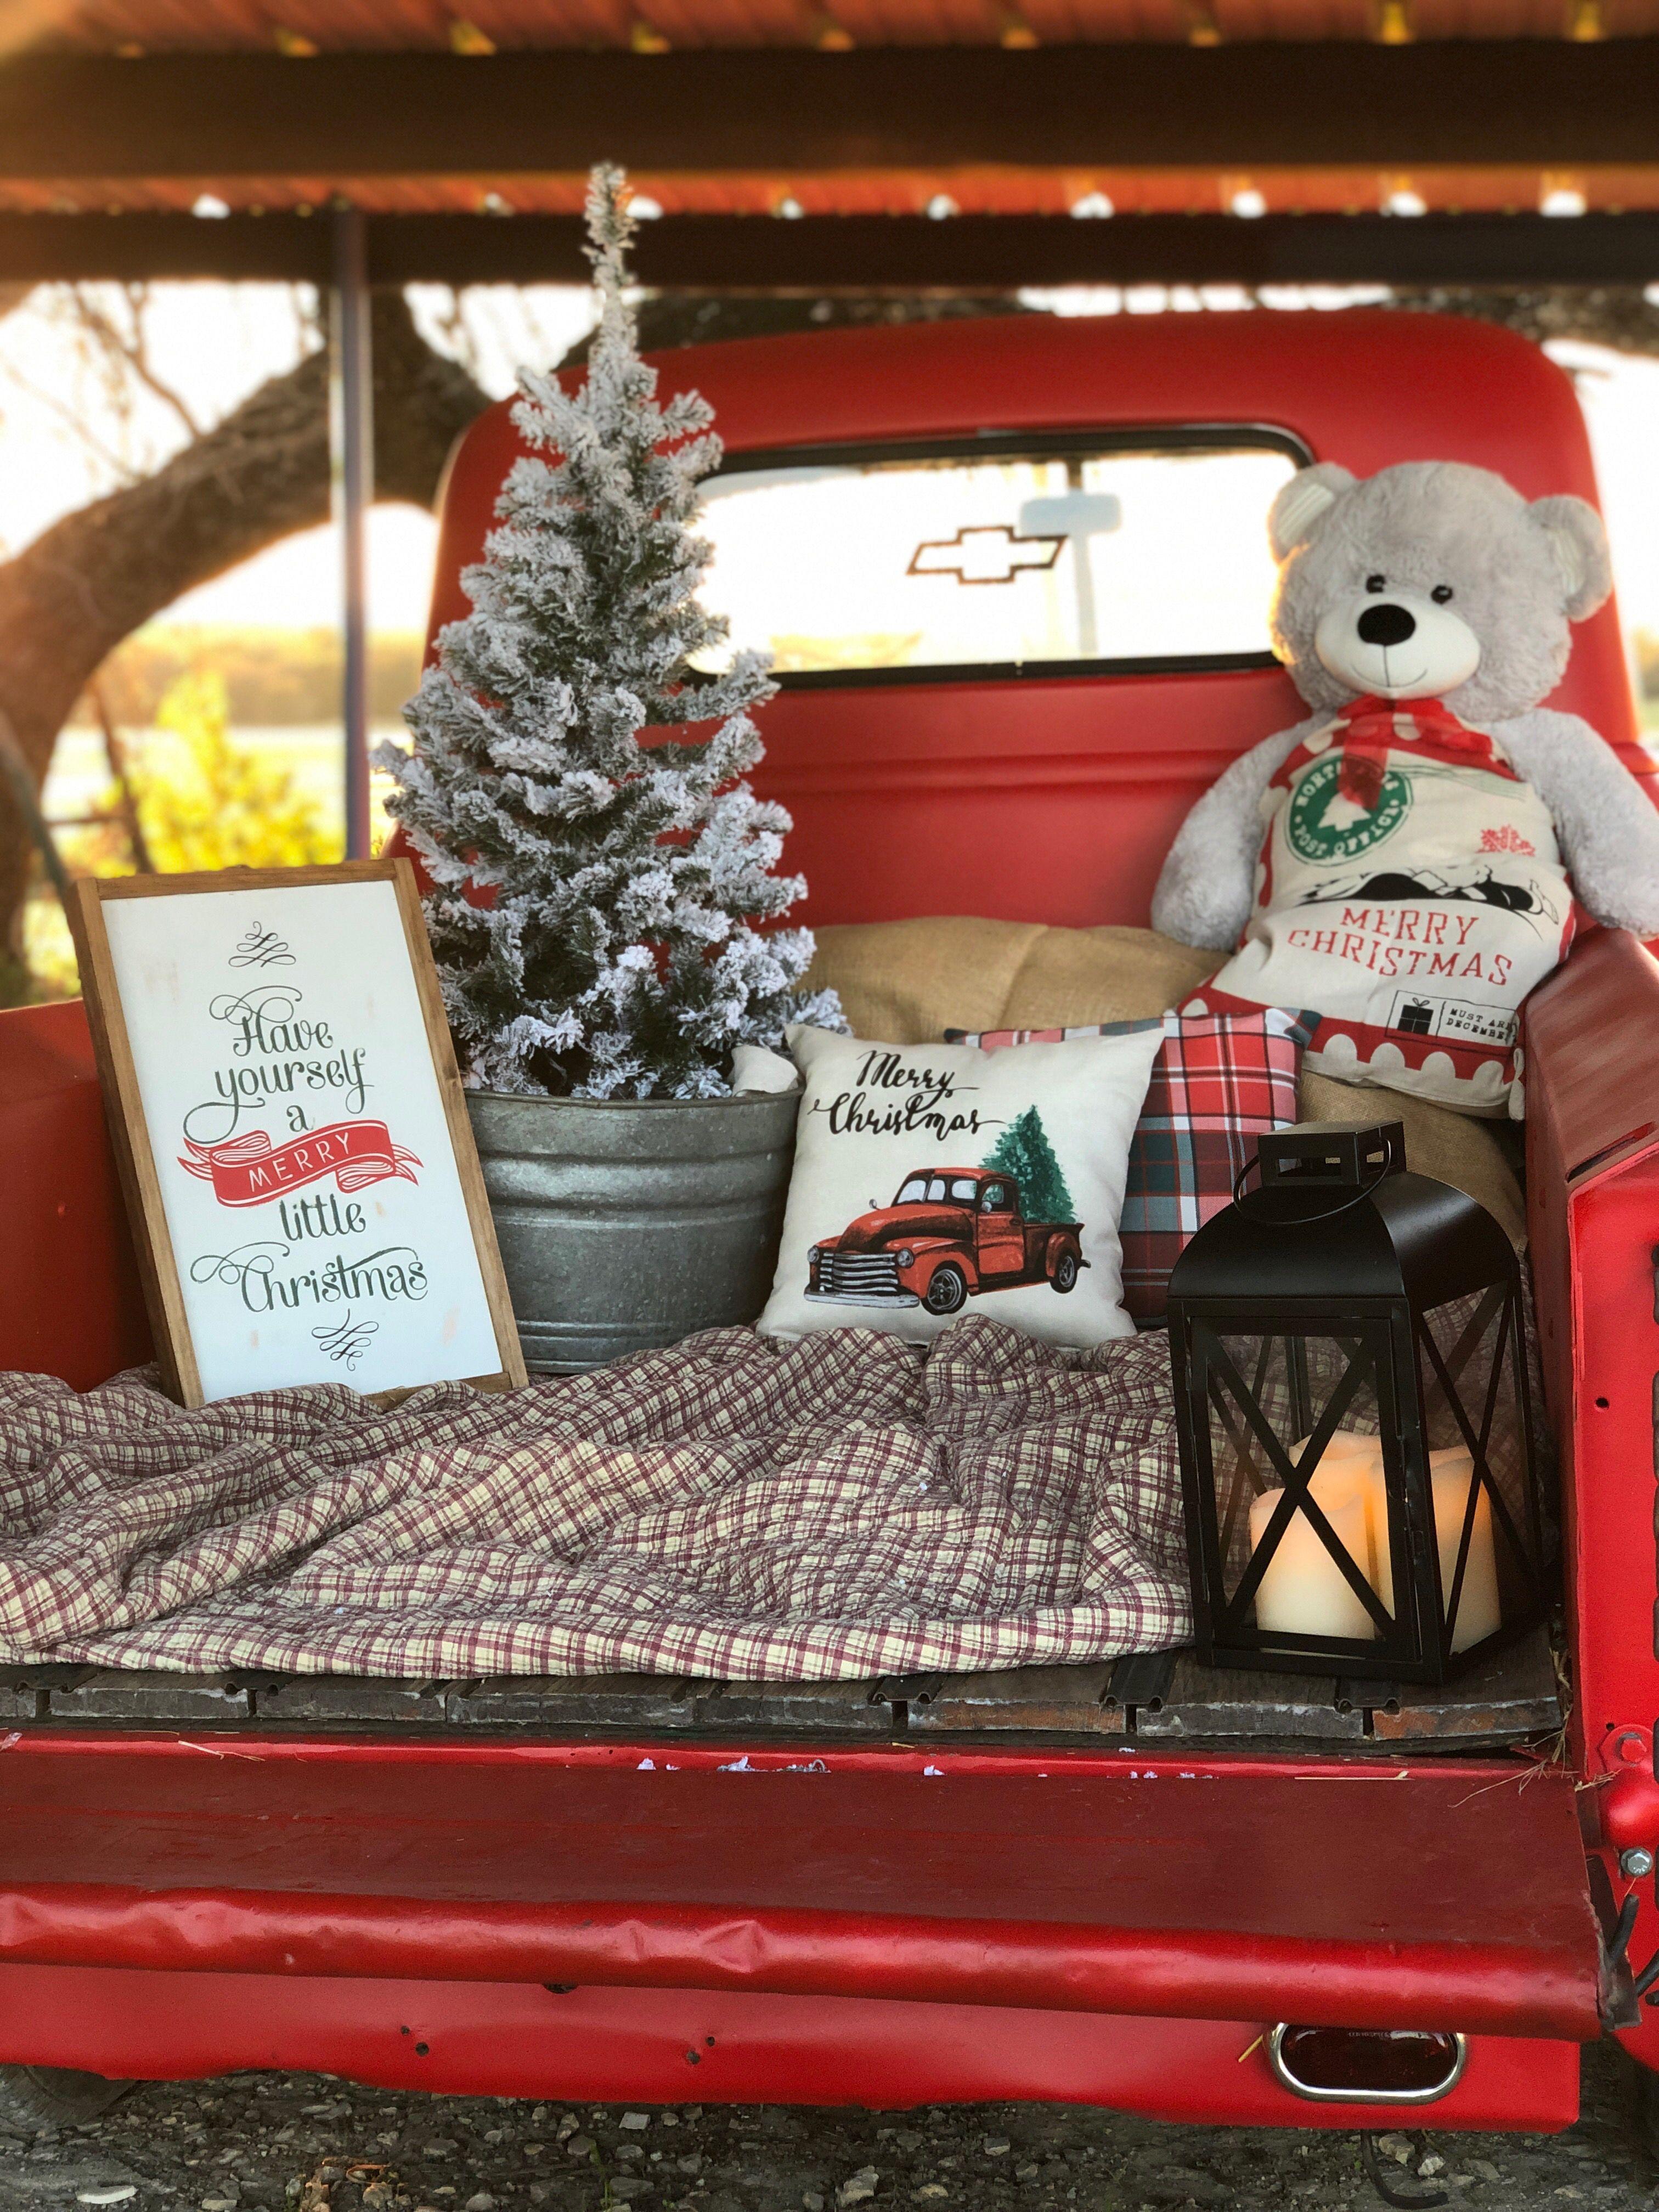 Christmas Digital Antique Truck Digital Backdrop Set of Two Christmas Truck Digital Backgrounds Christmas Truck Antique Christmas Truck